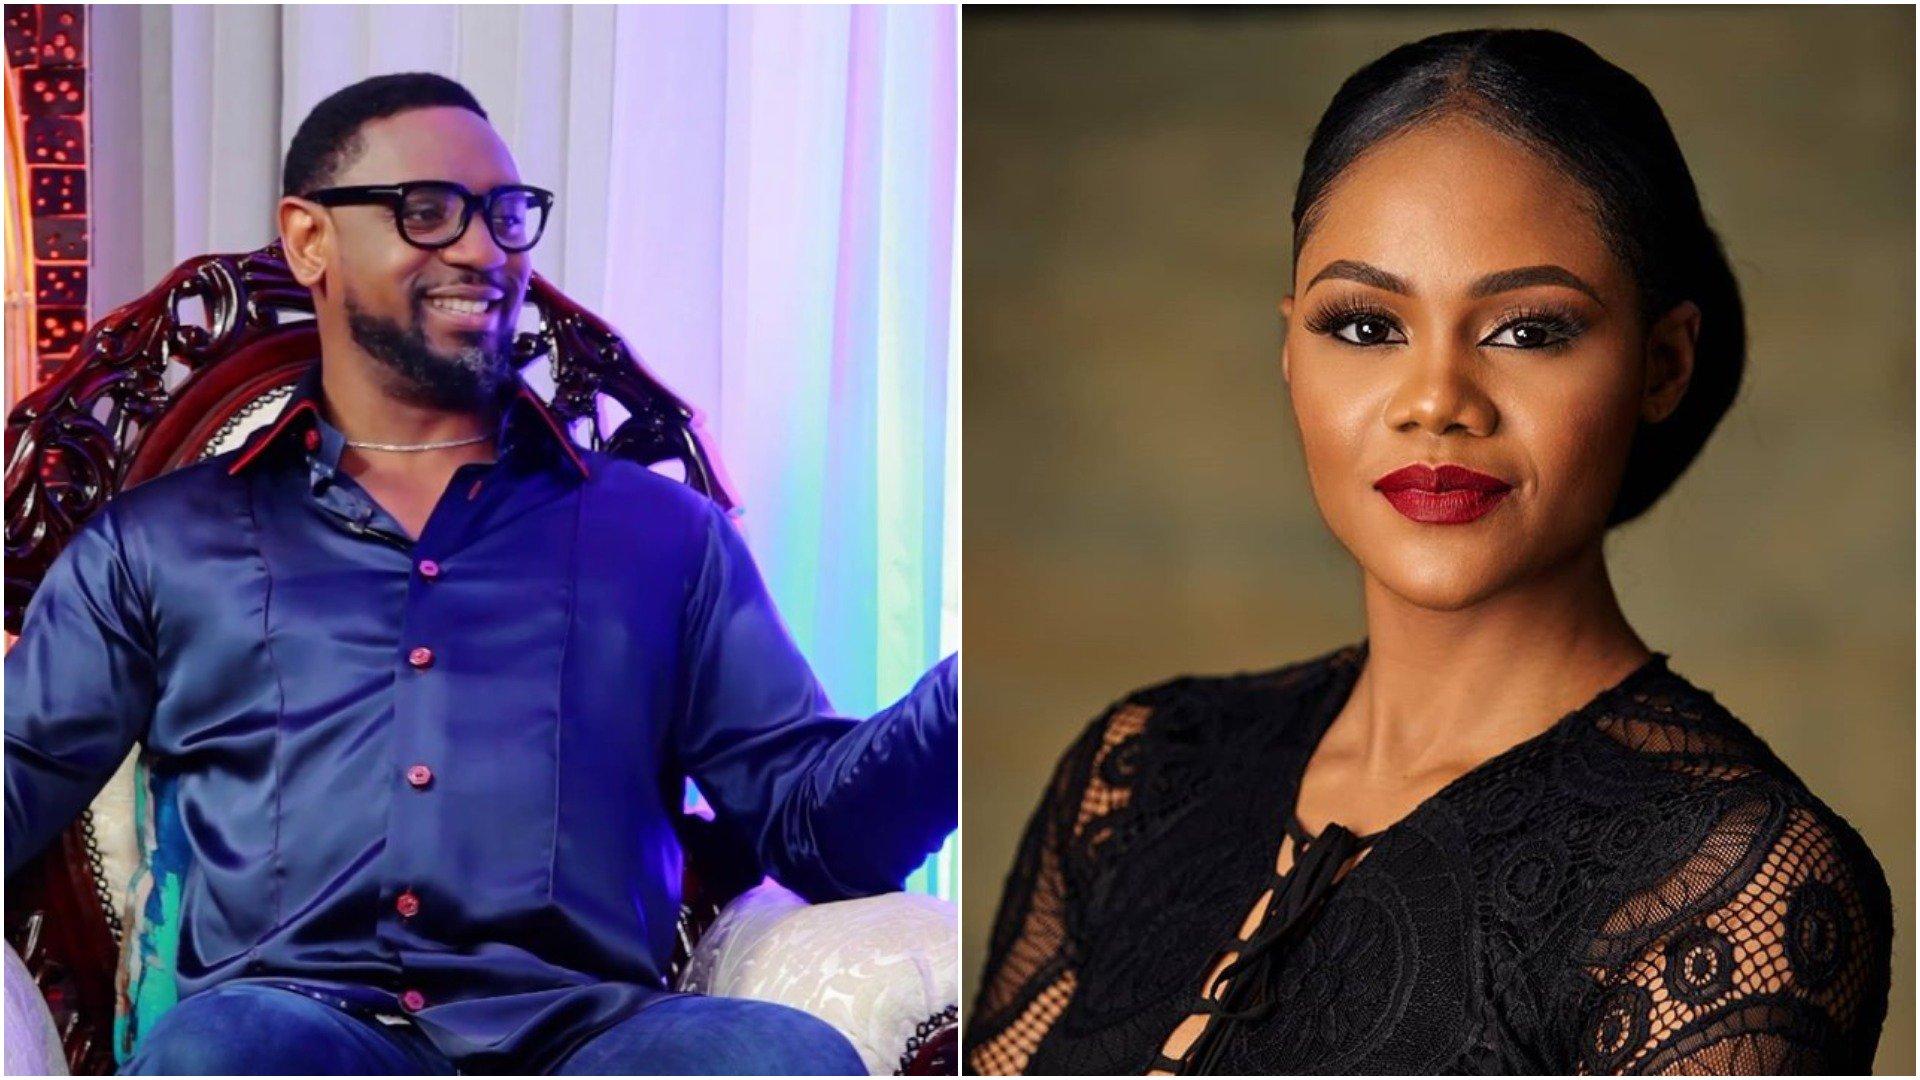 Fatoyinbo Raped Me – Timi Dakolo's Wife